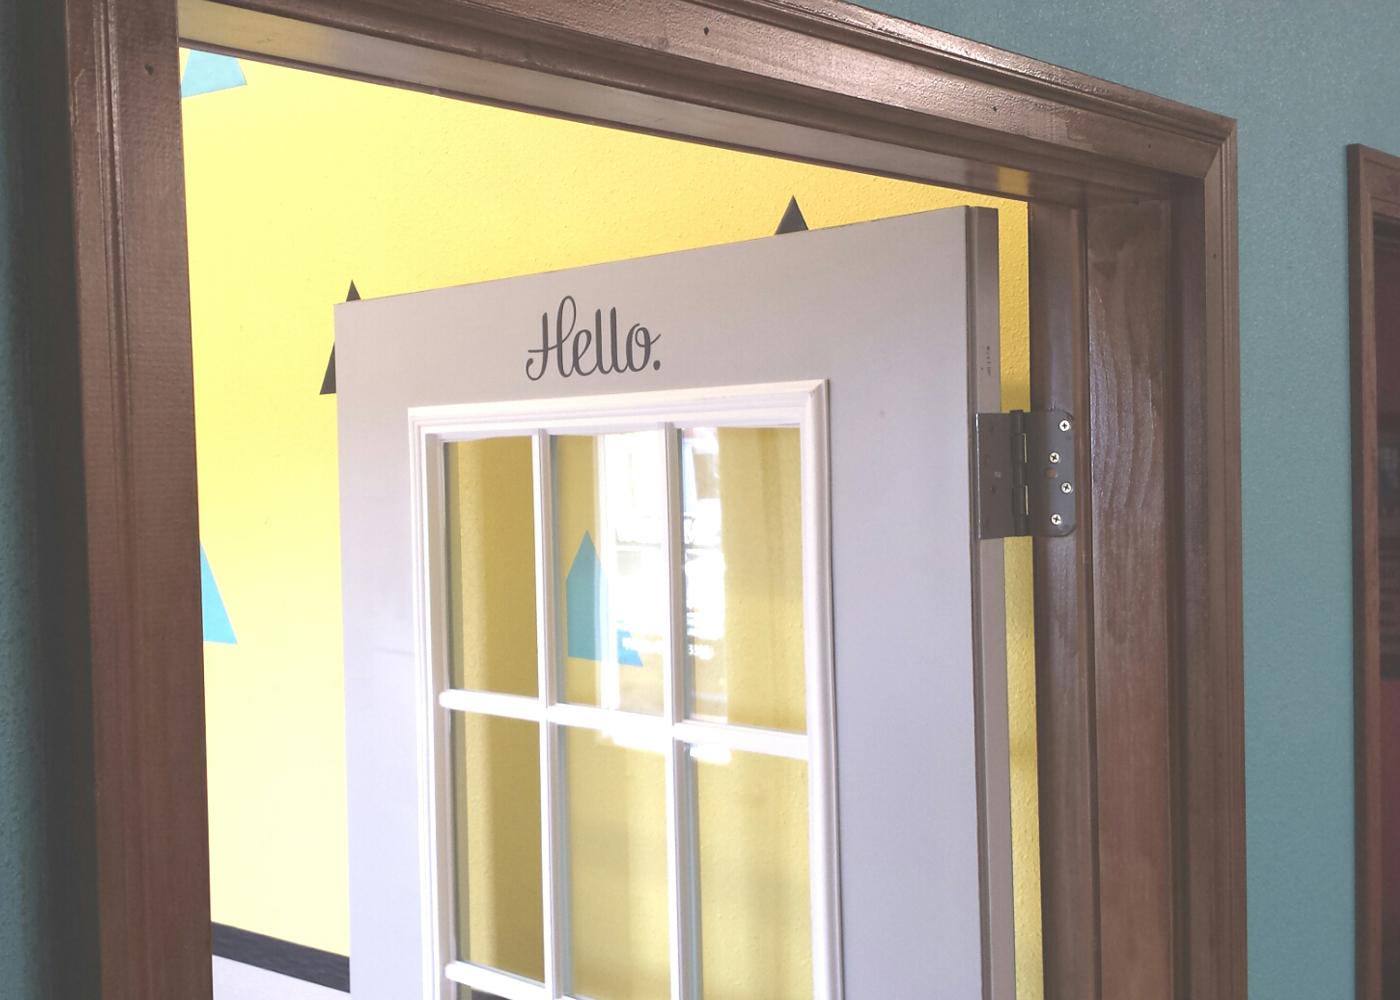 da023-h-i-hello-goodbye-entryway-wall-decal-quote.jpg